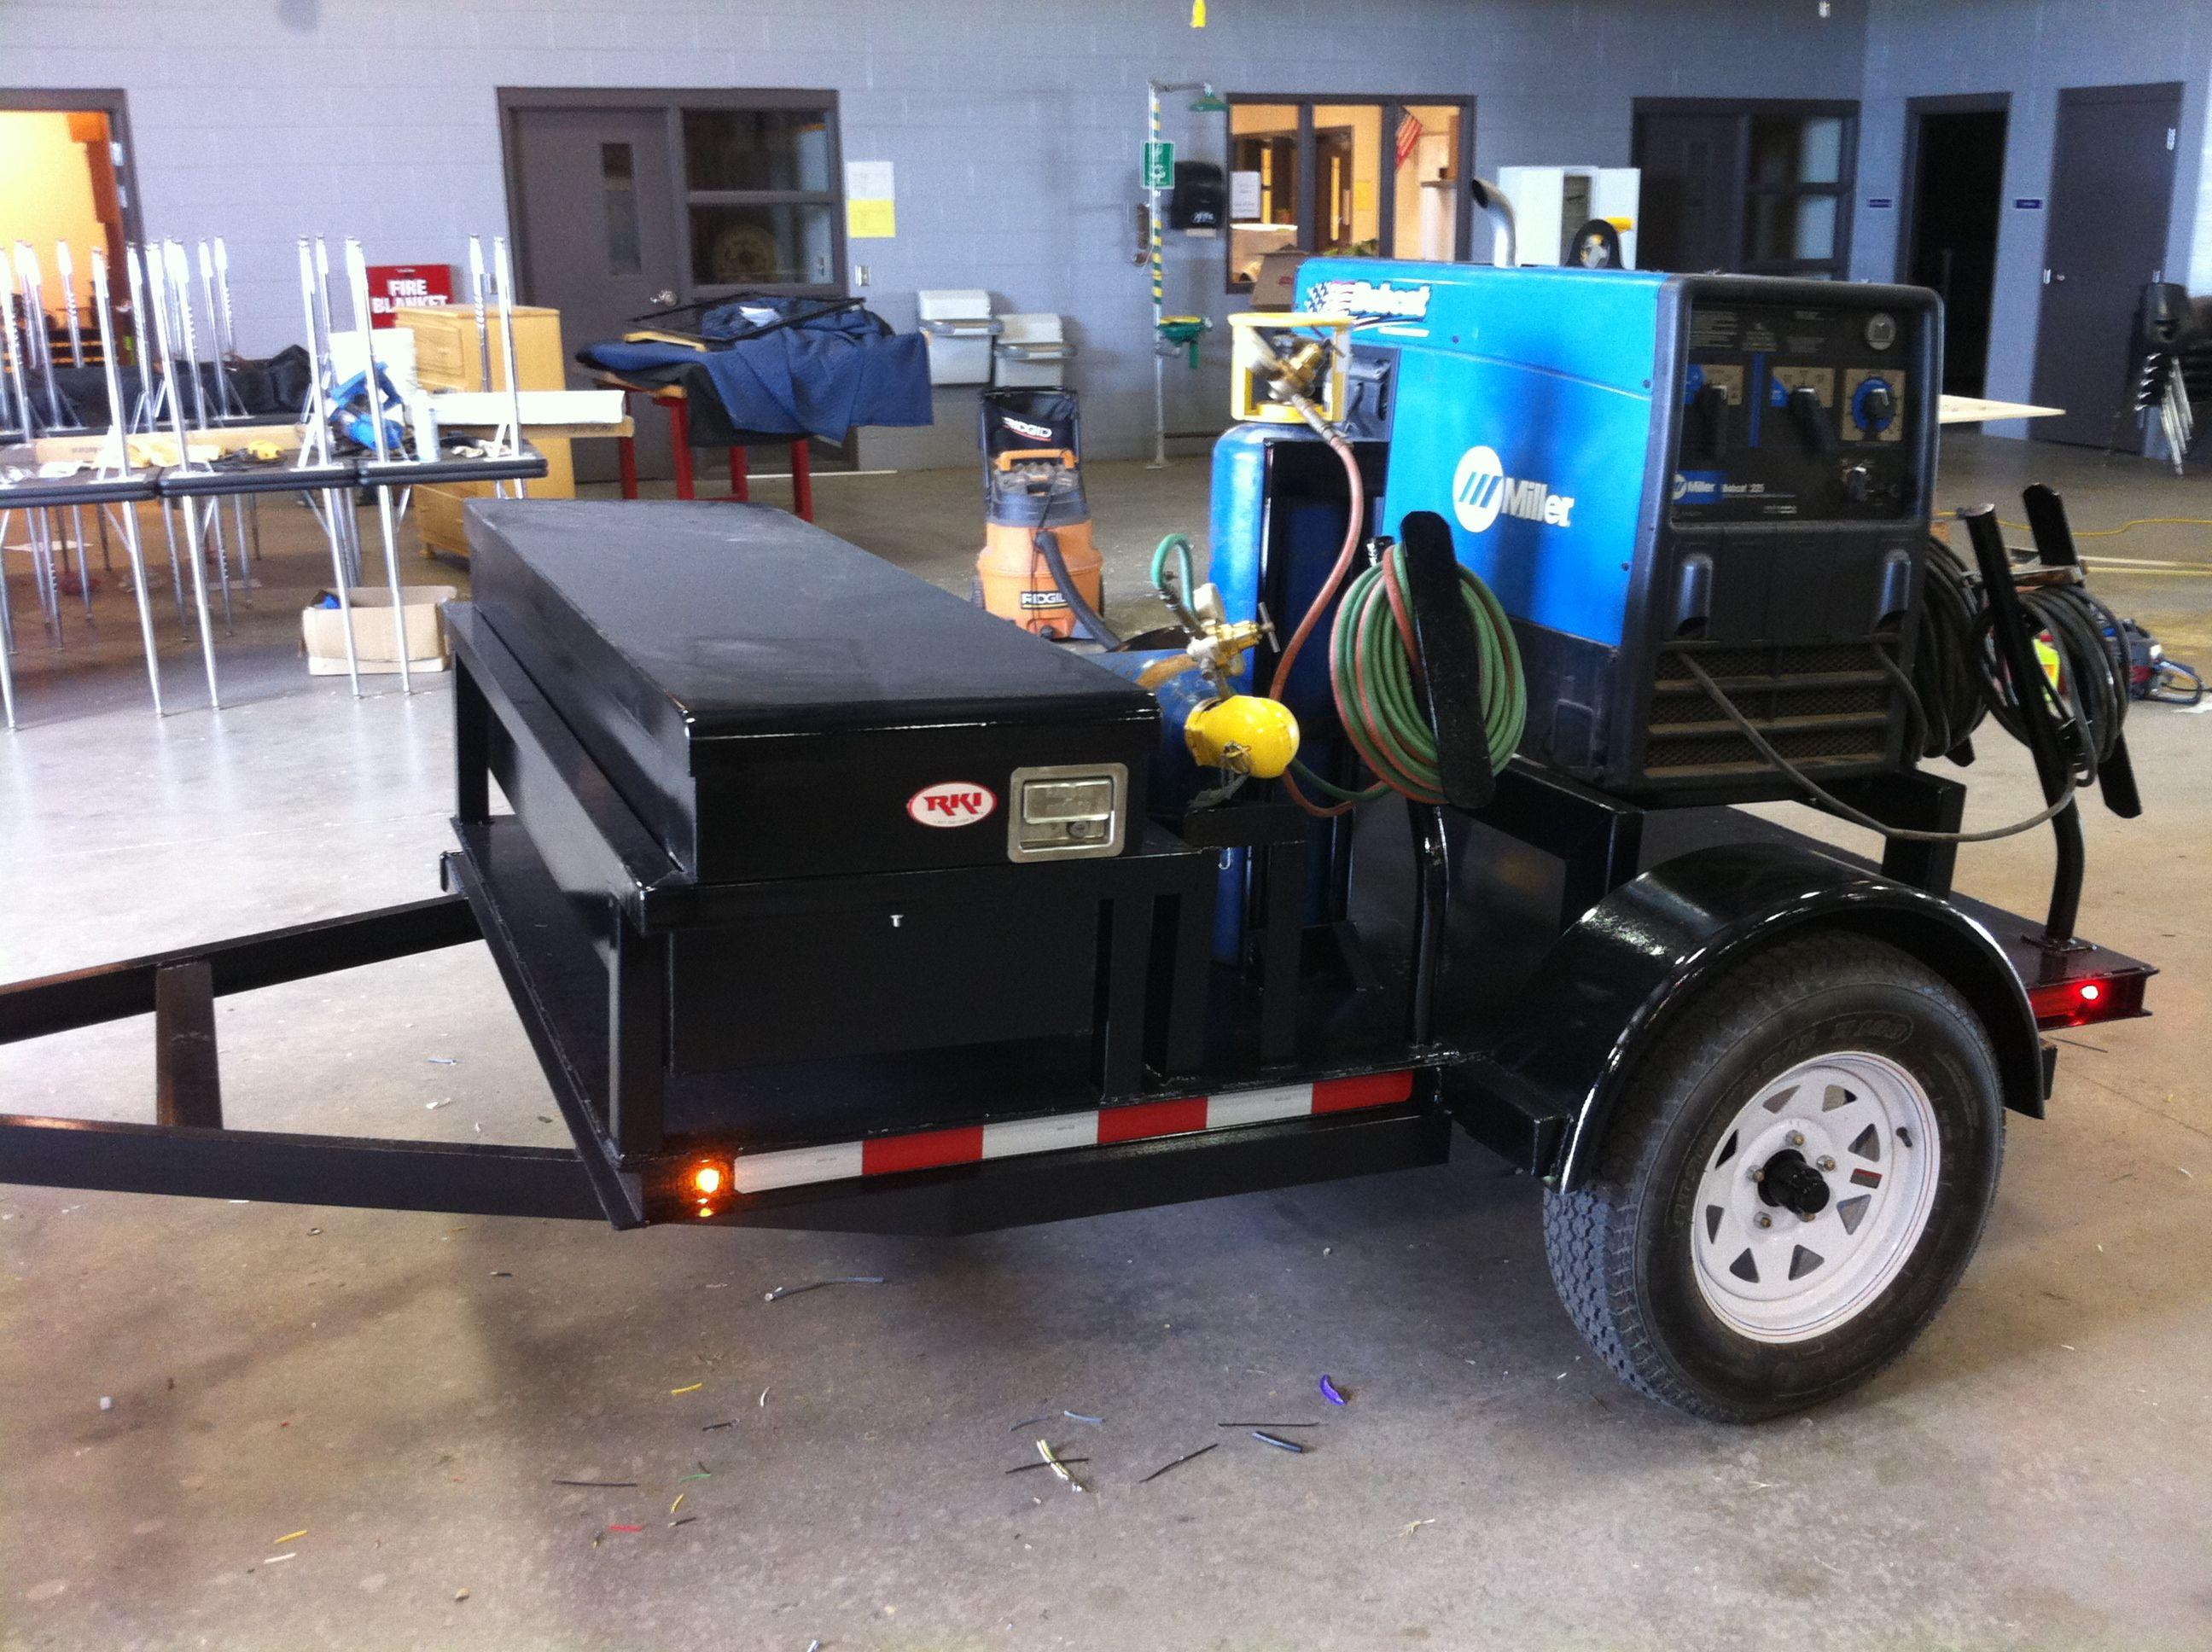 Welding Trailer Welding trailer, Welding projects